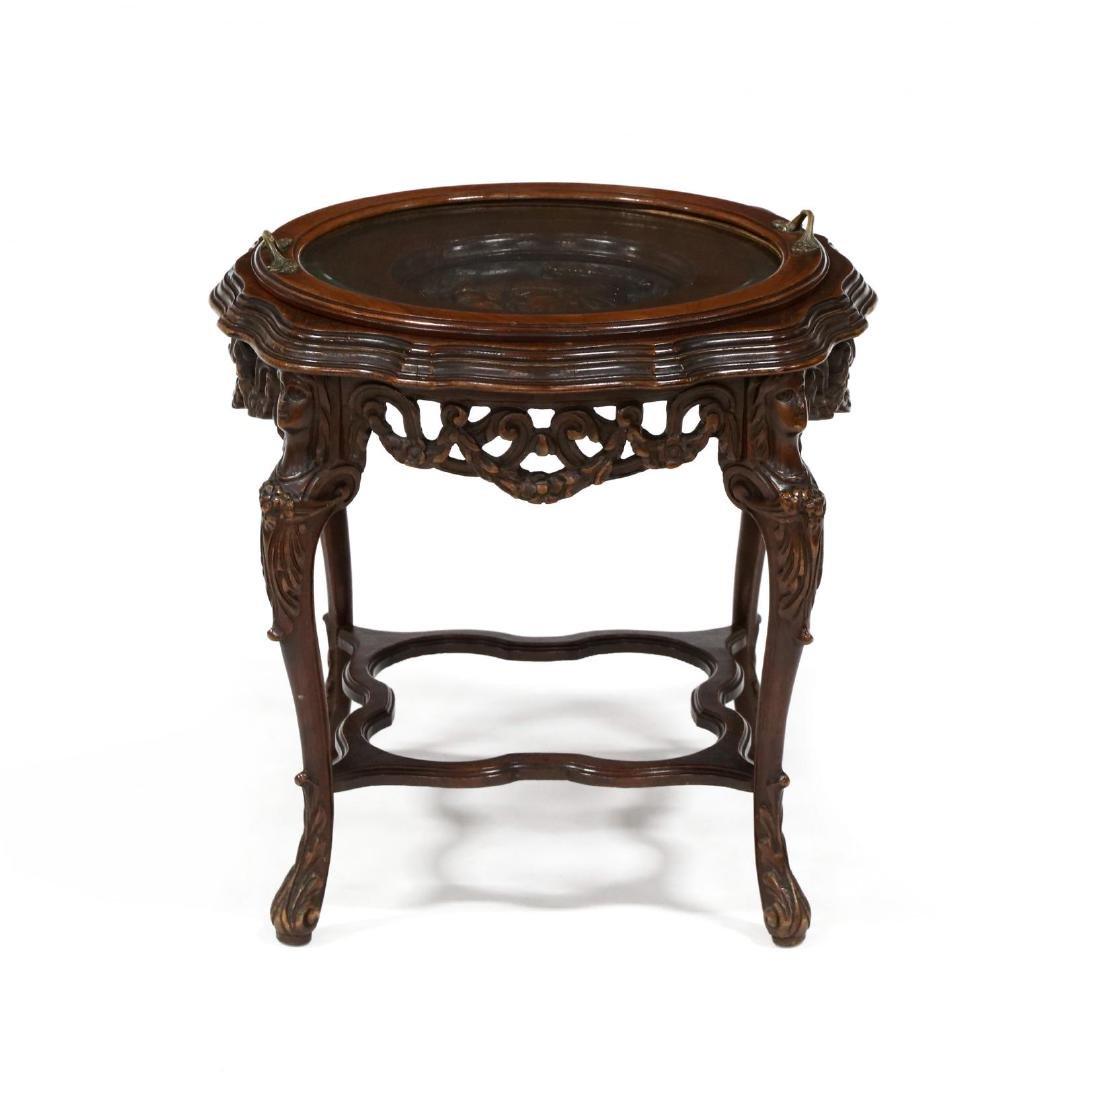 Vintage Italian Carved Walnut Figural Tray Table